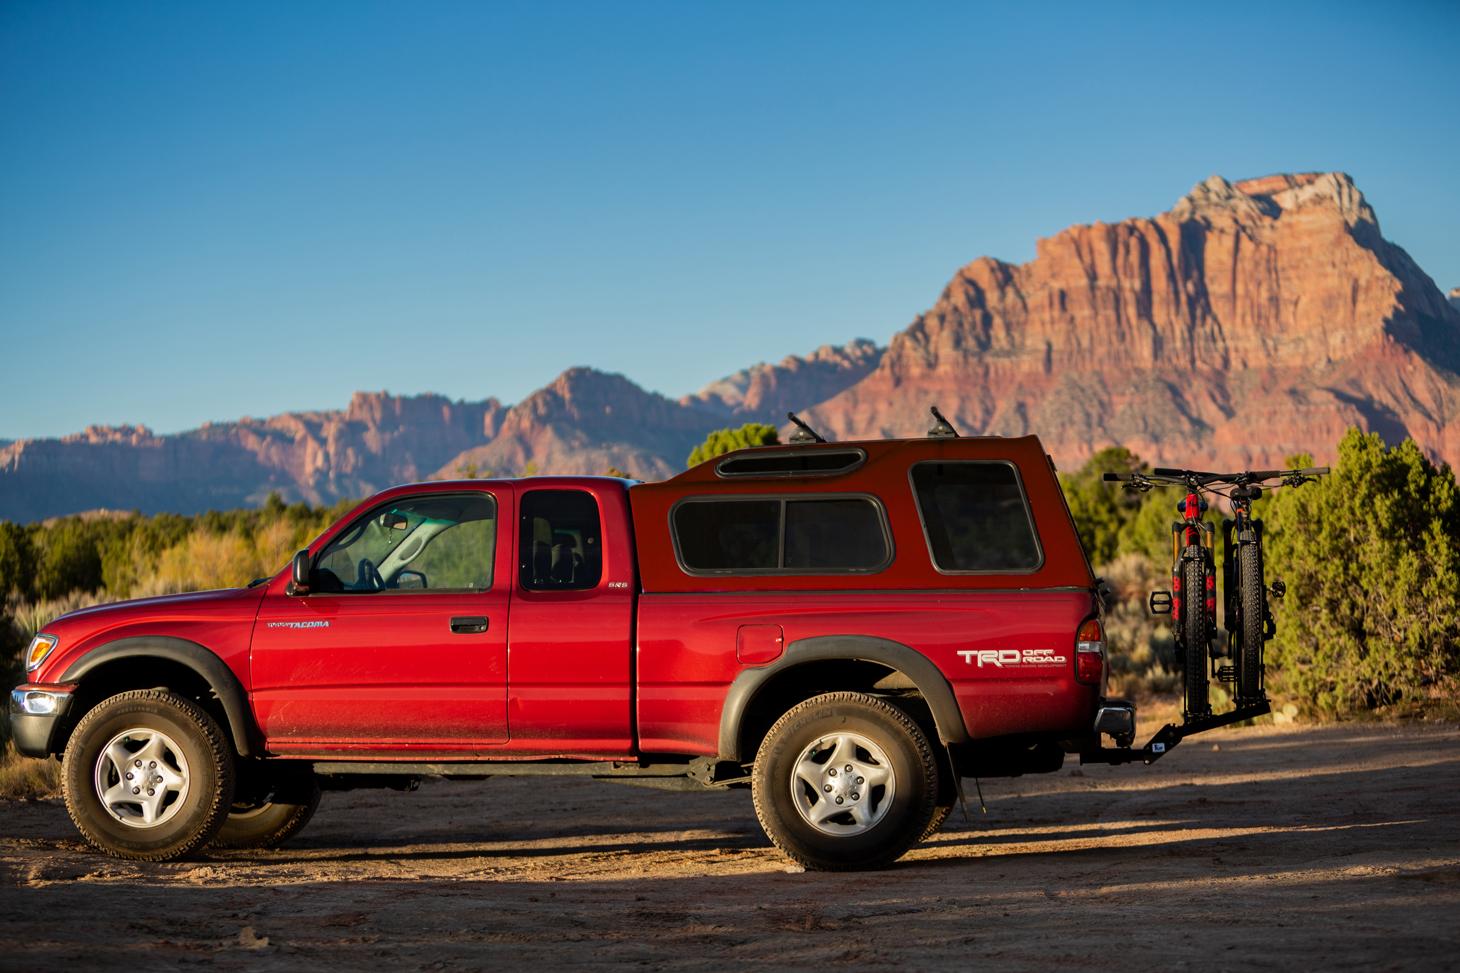 1up-usa-black-heavy-duty-double-rack-southern-utah-sunset-zion-full-truck.jpg